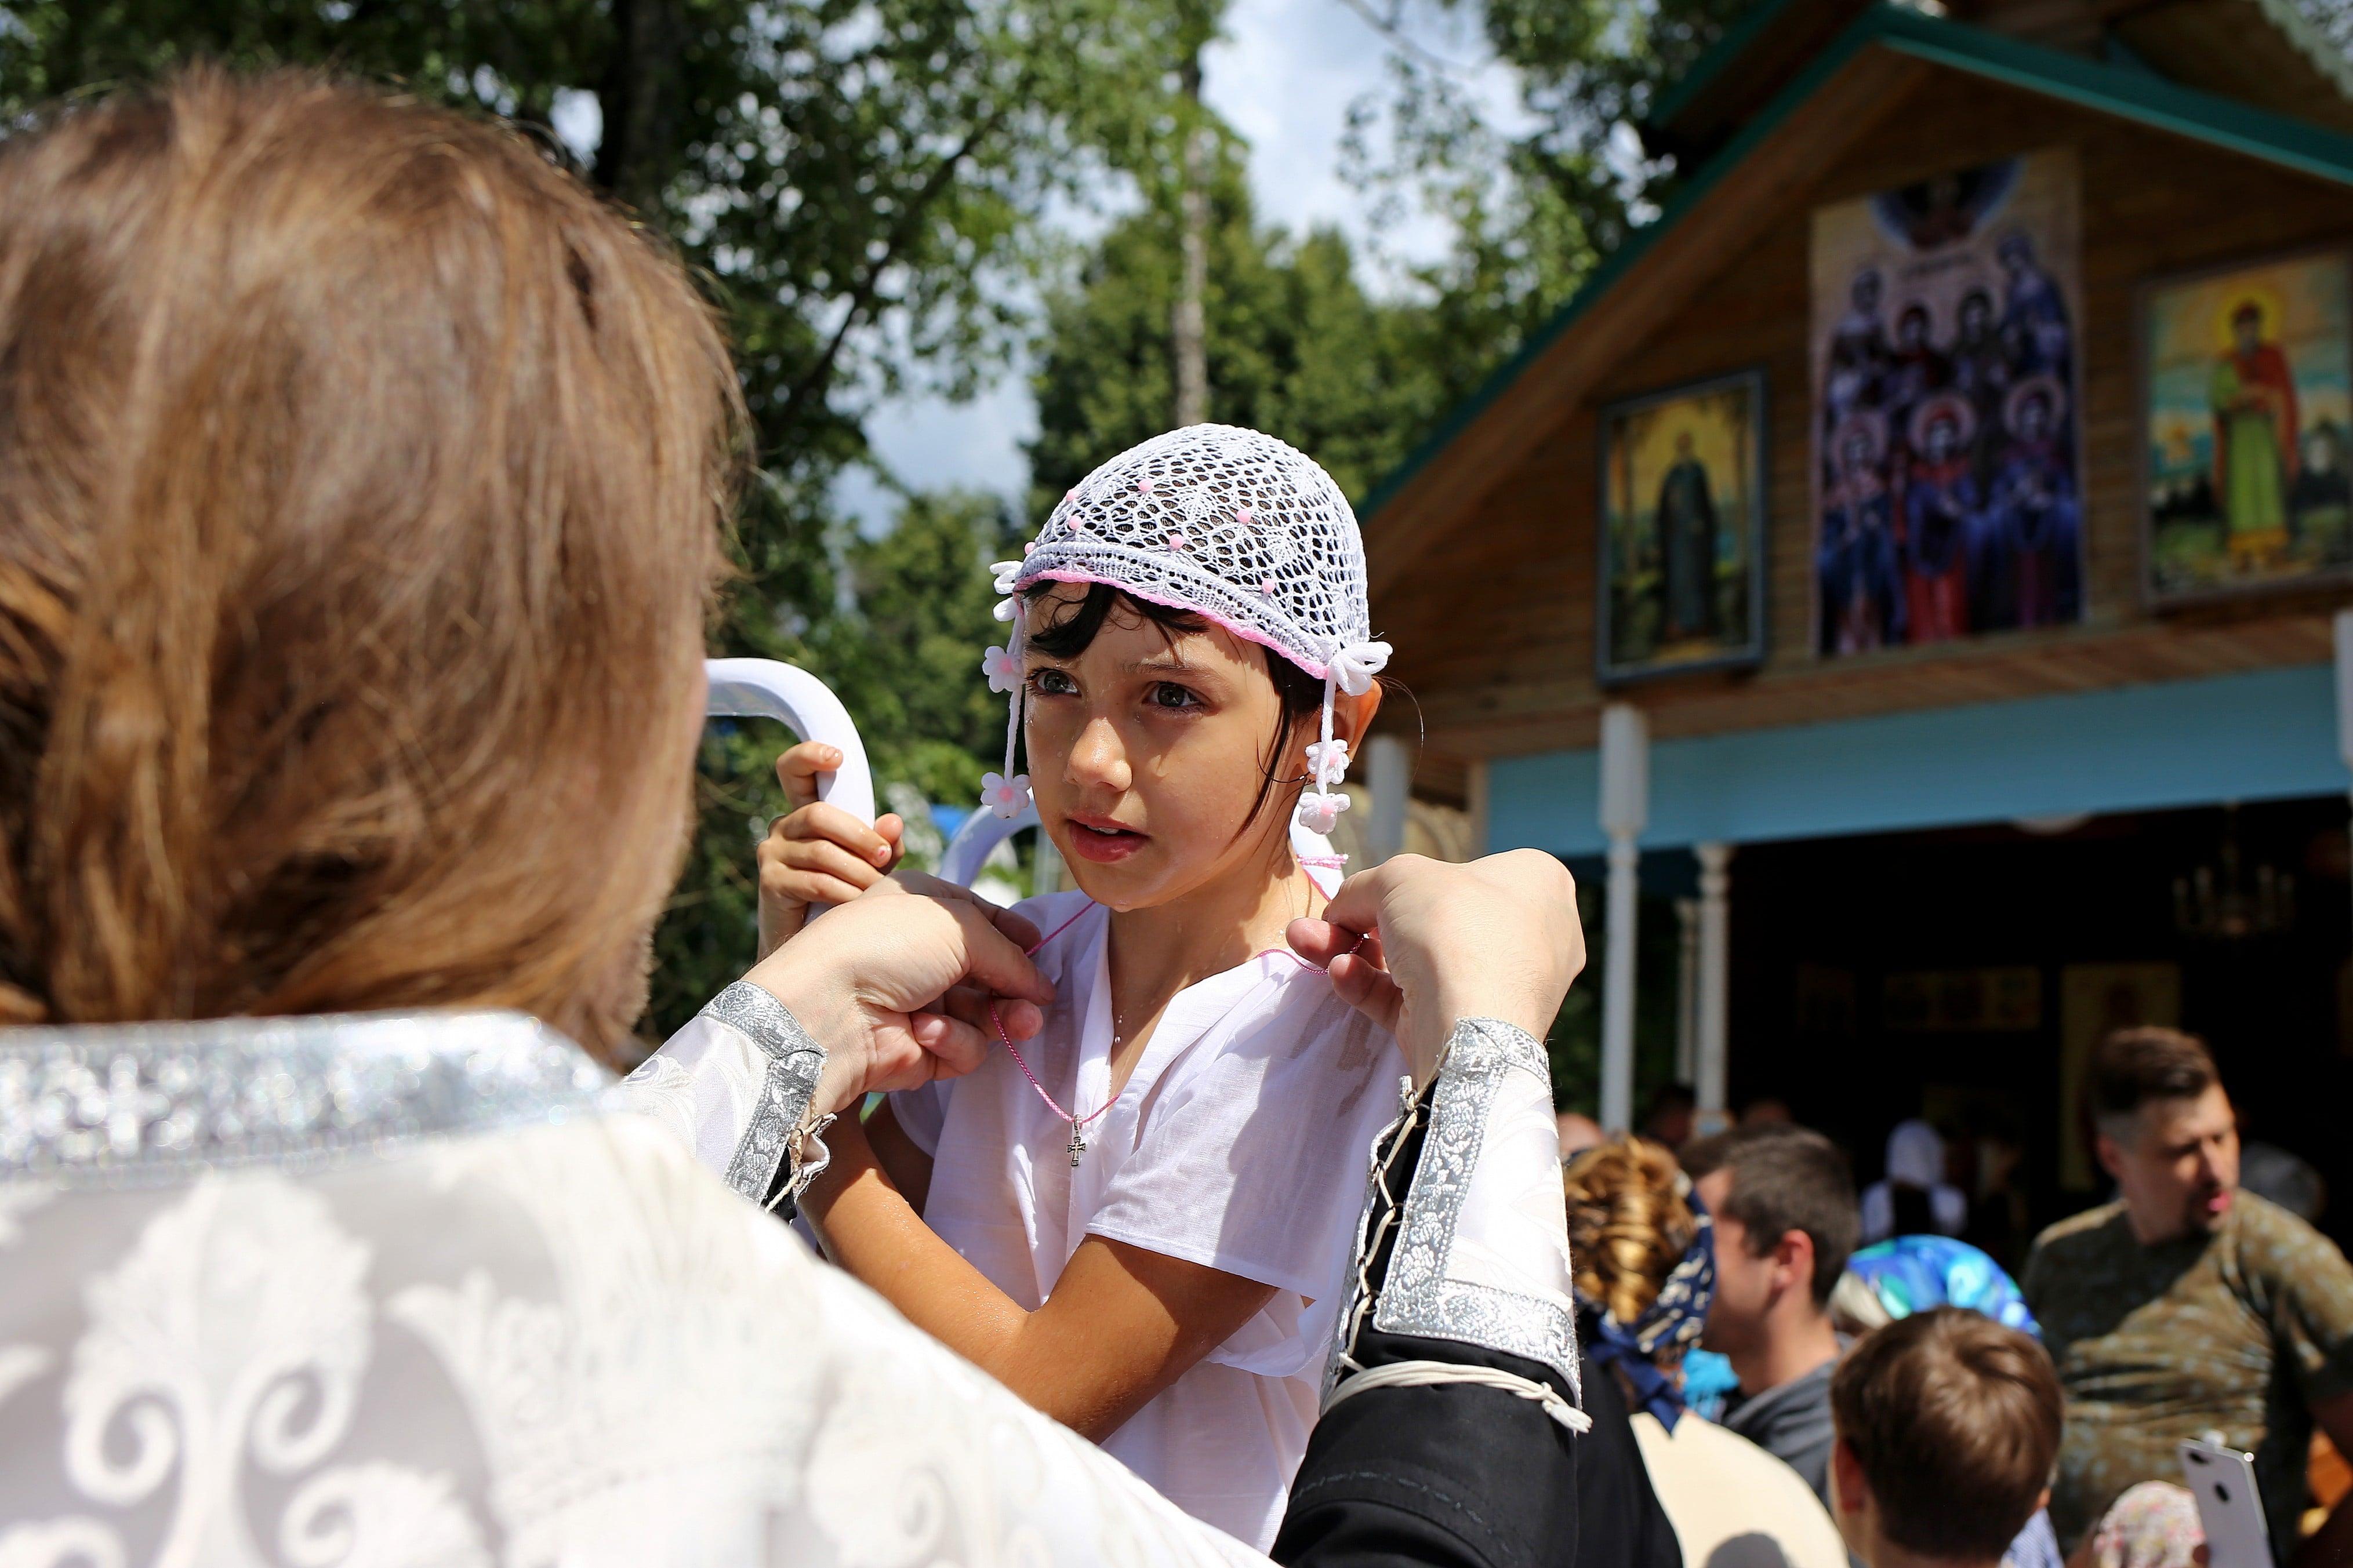 http://monuspen.ru/photoreports/05ebf668e768d798de912e37199ebe12.jpg